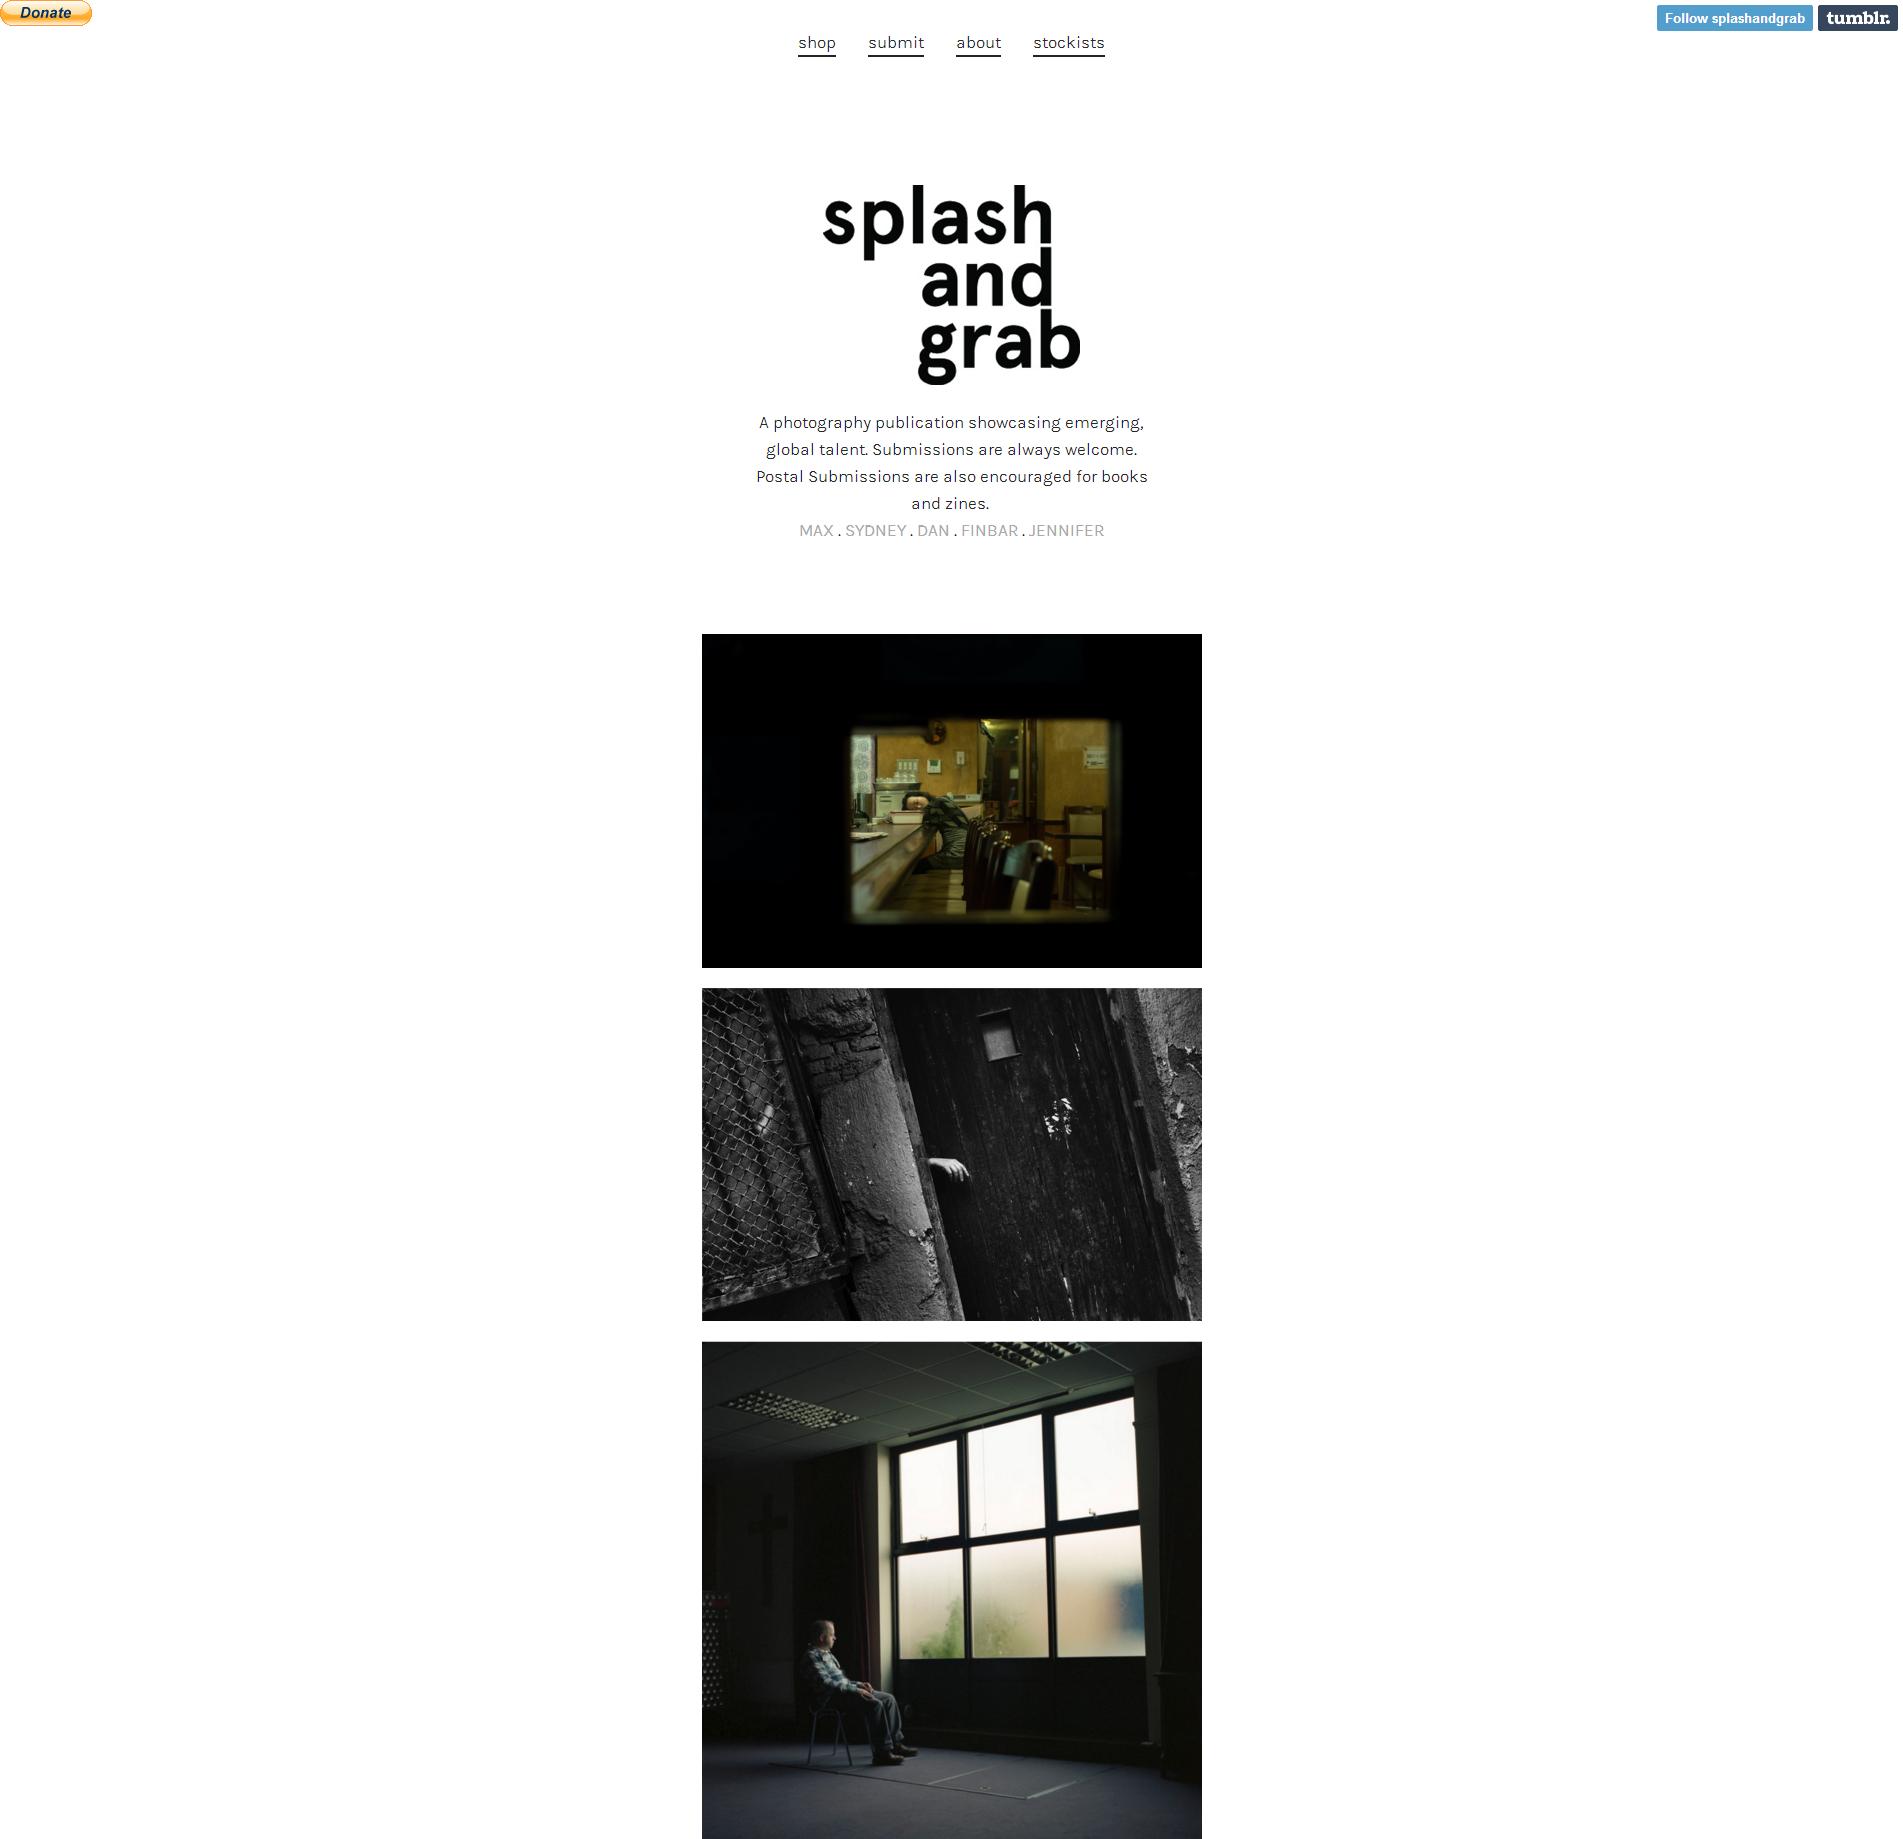 splashandgrab.co.uk_post_142684722845_weekly-selection-1-benedetta-risto-2-tim-gao-3